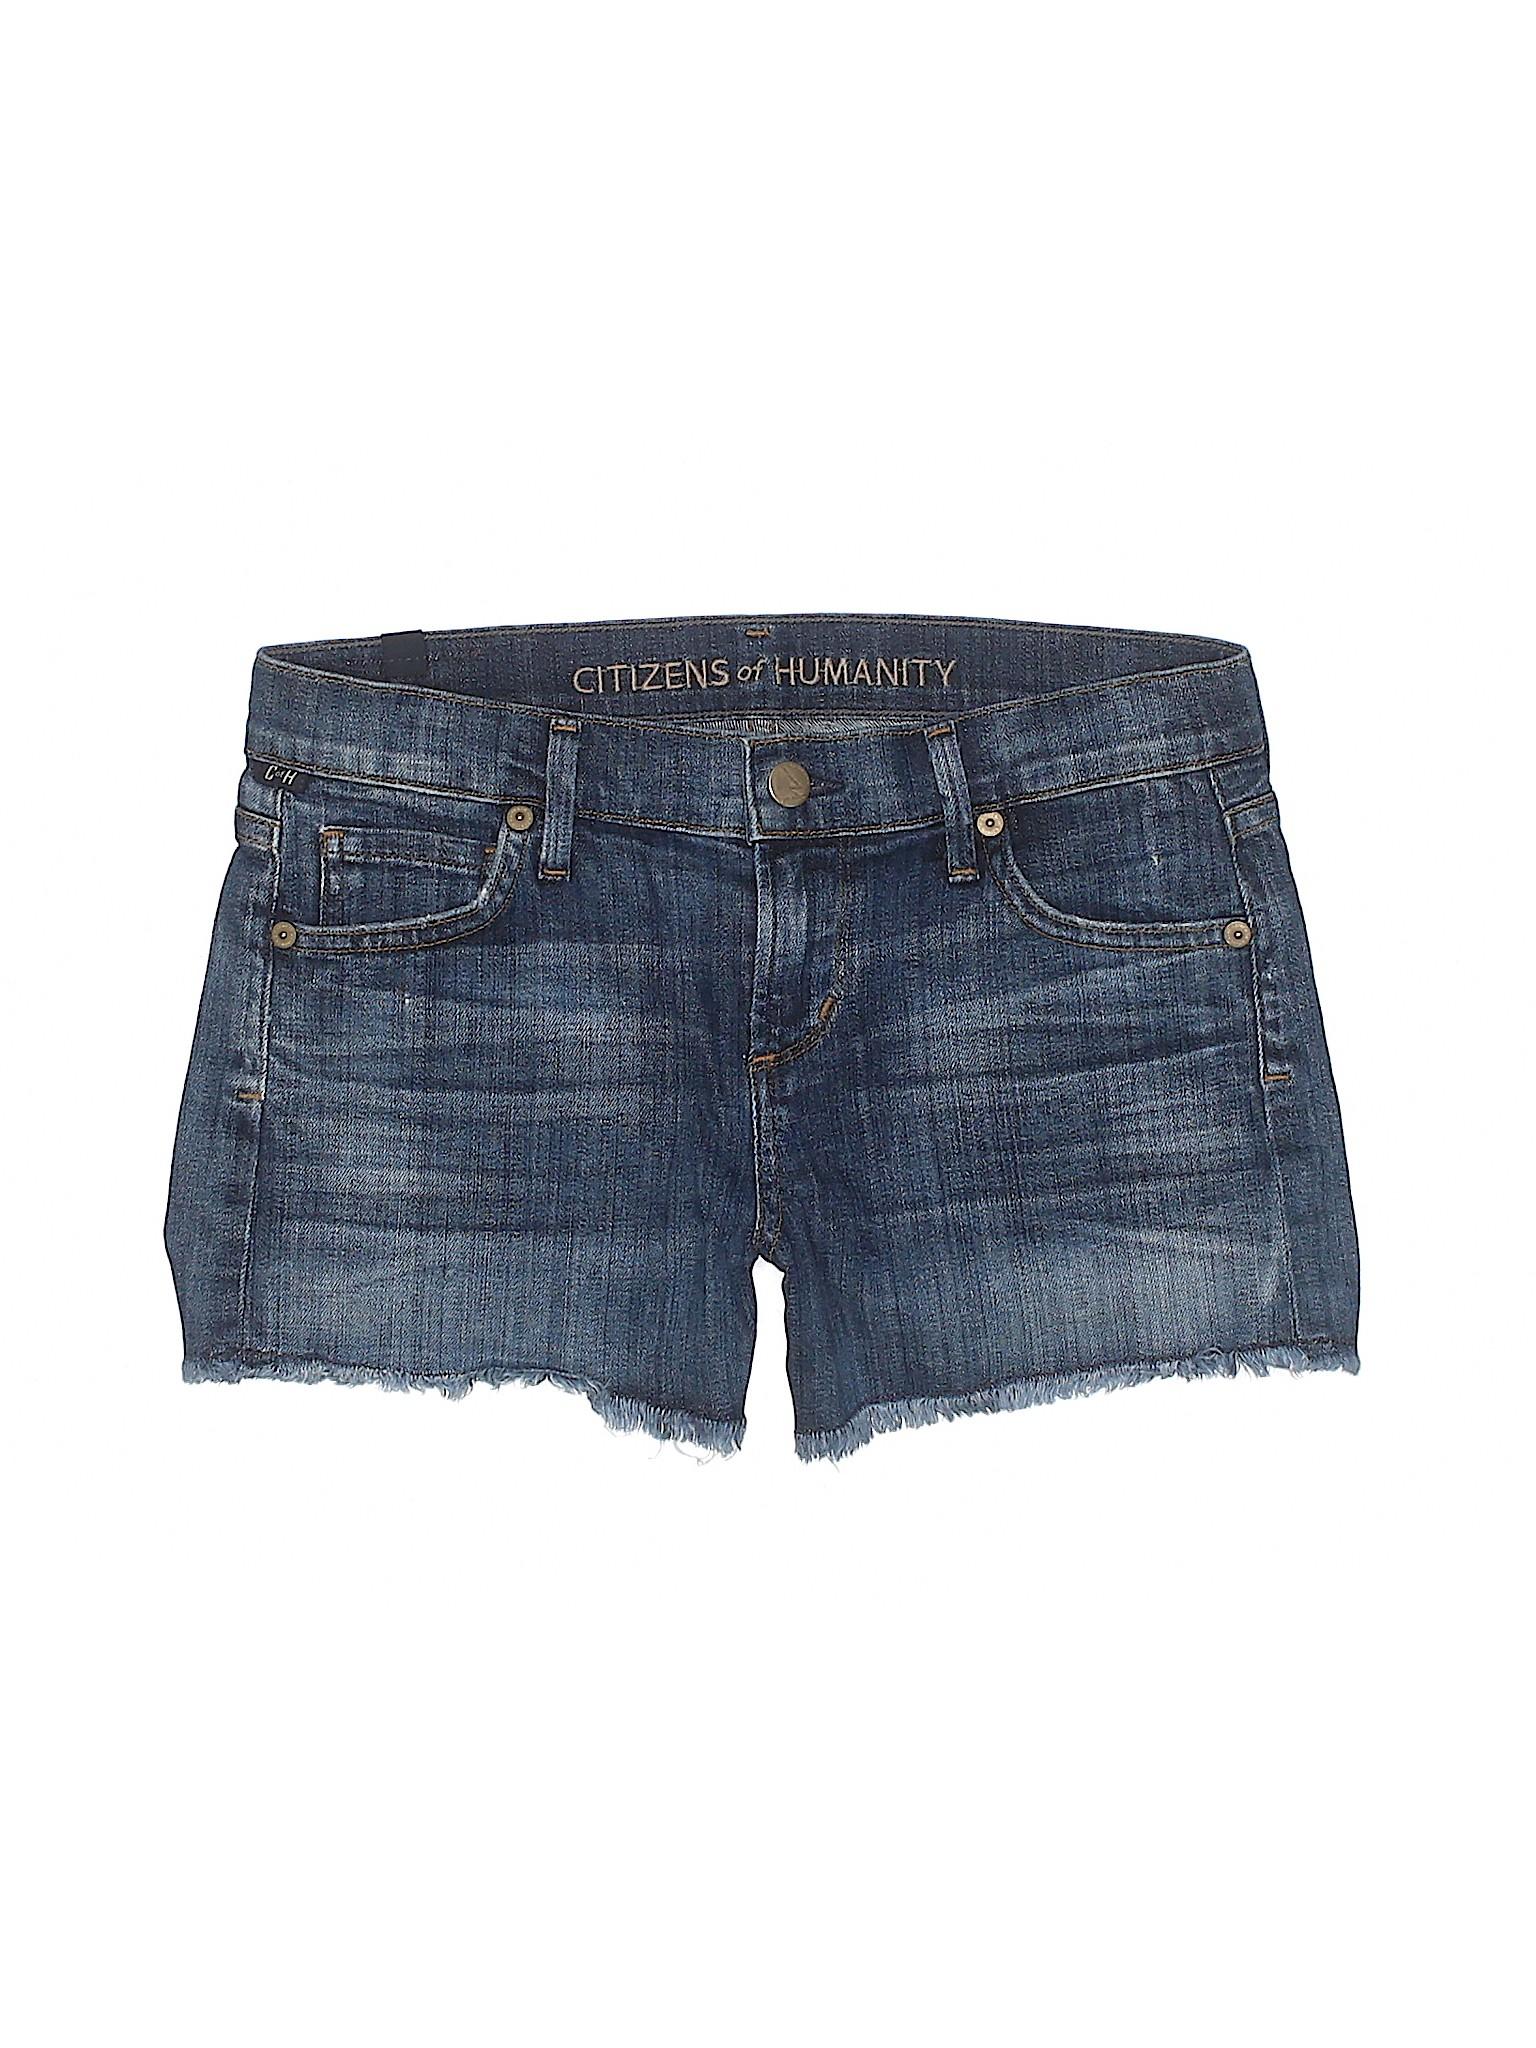 of Humanity Boutique Citizens Denim Shorts 8qE5rEF